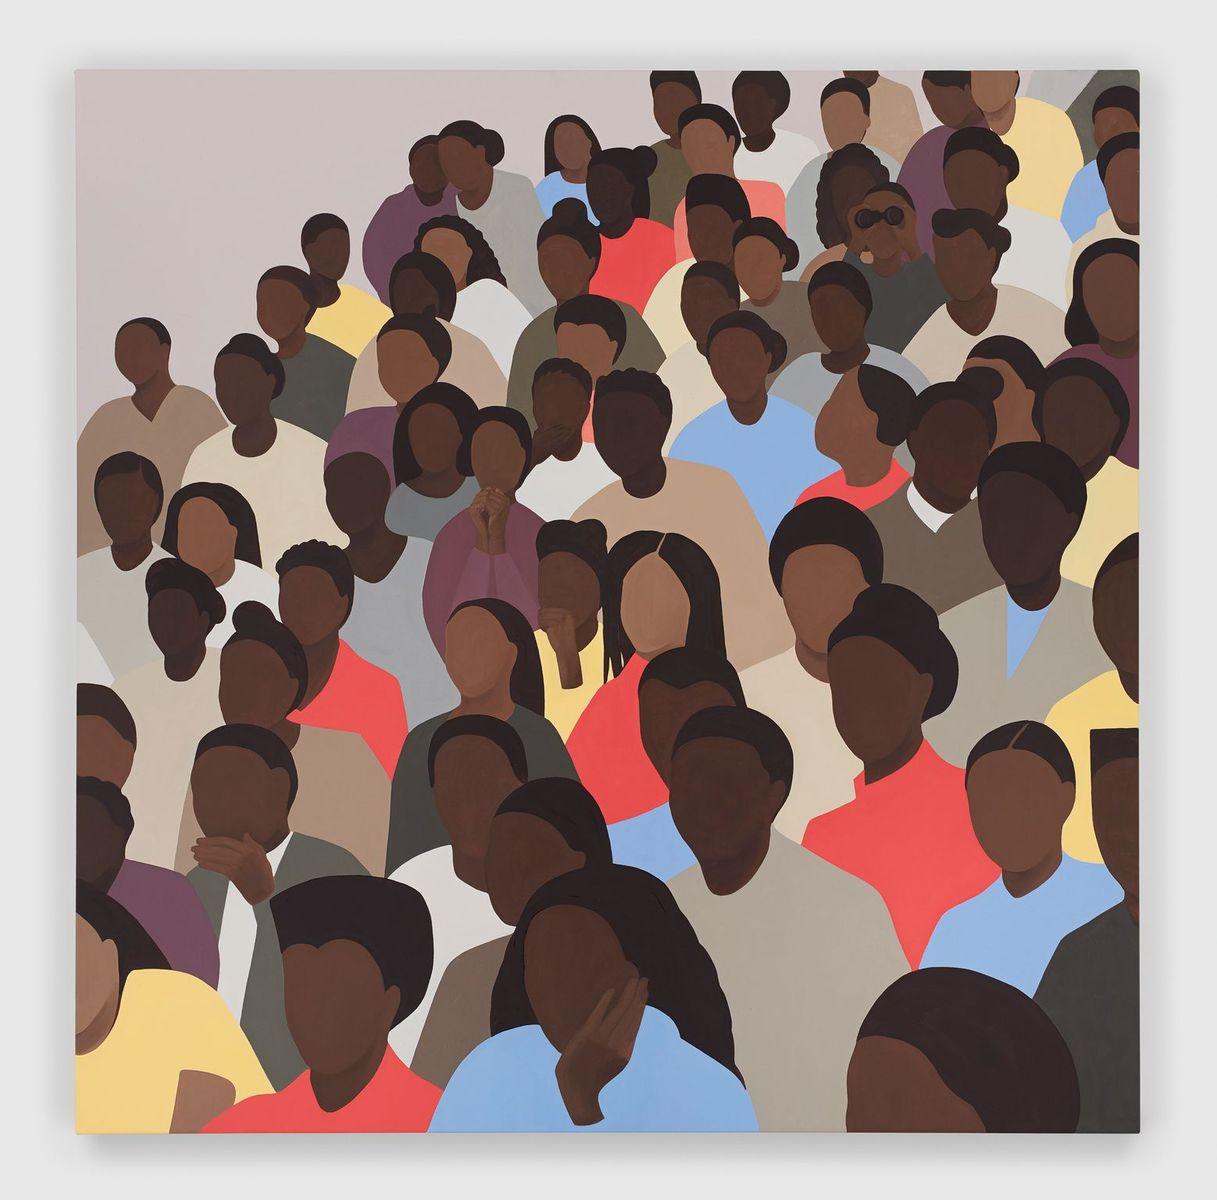 Thenjiwe Niki Nkosi, 'Audience', 2020, courtesy of the artist